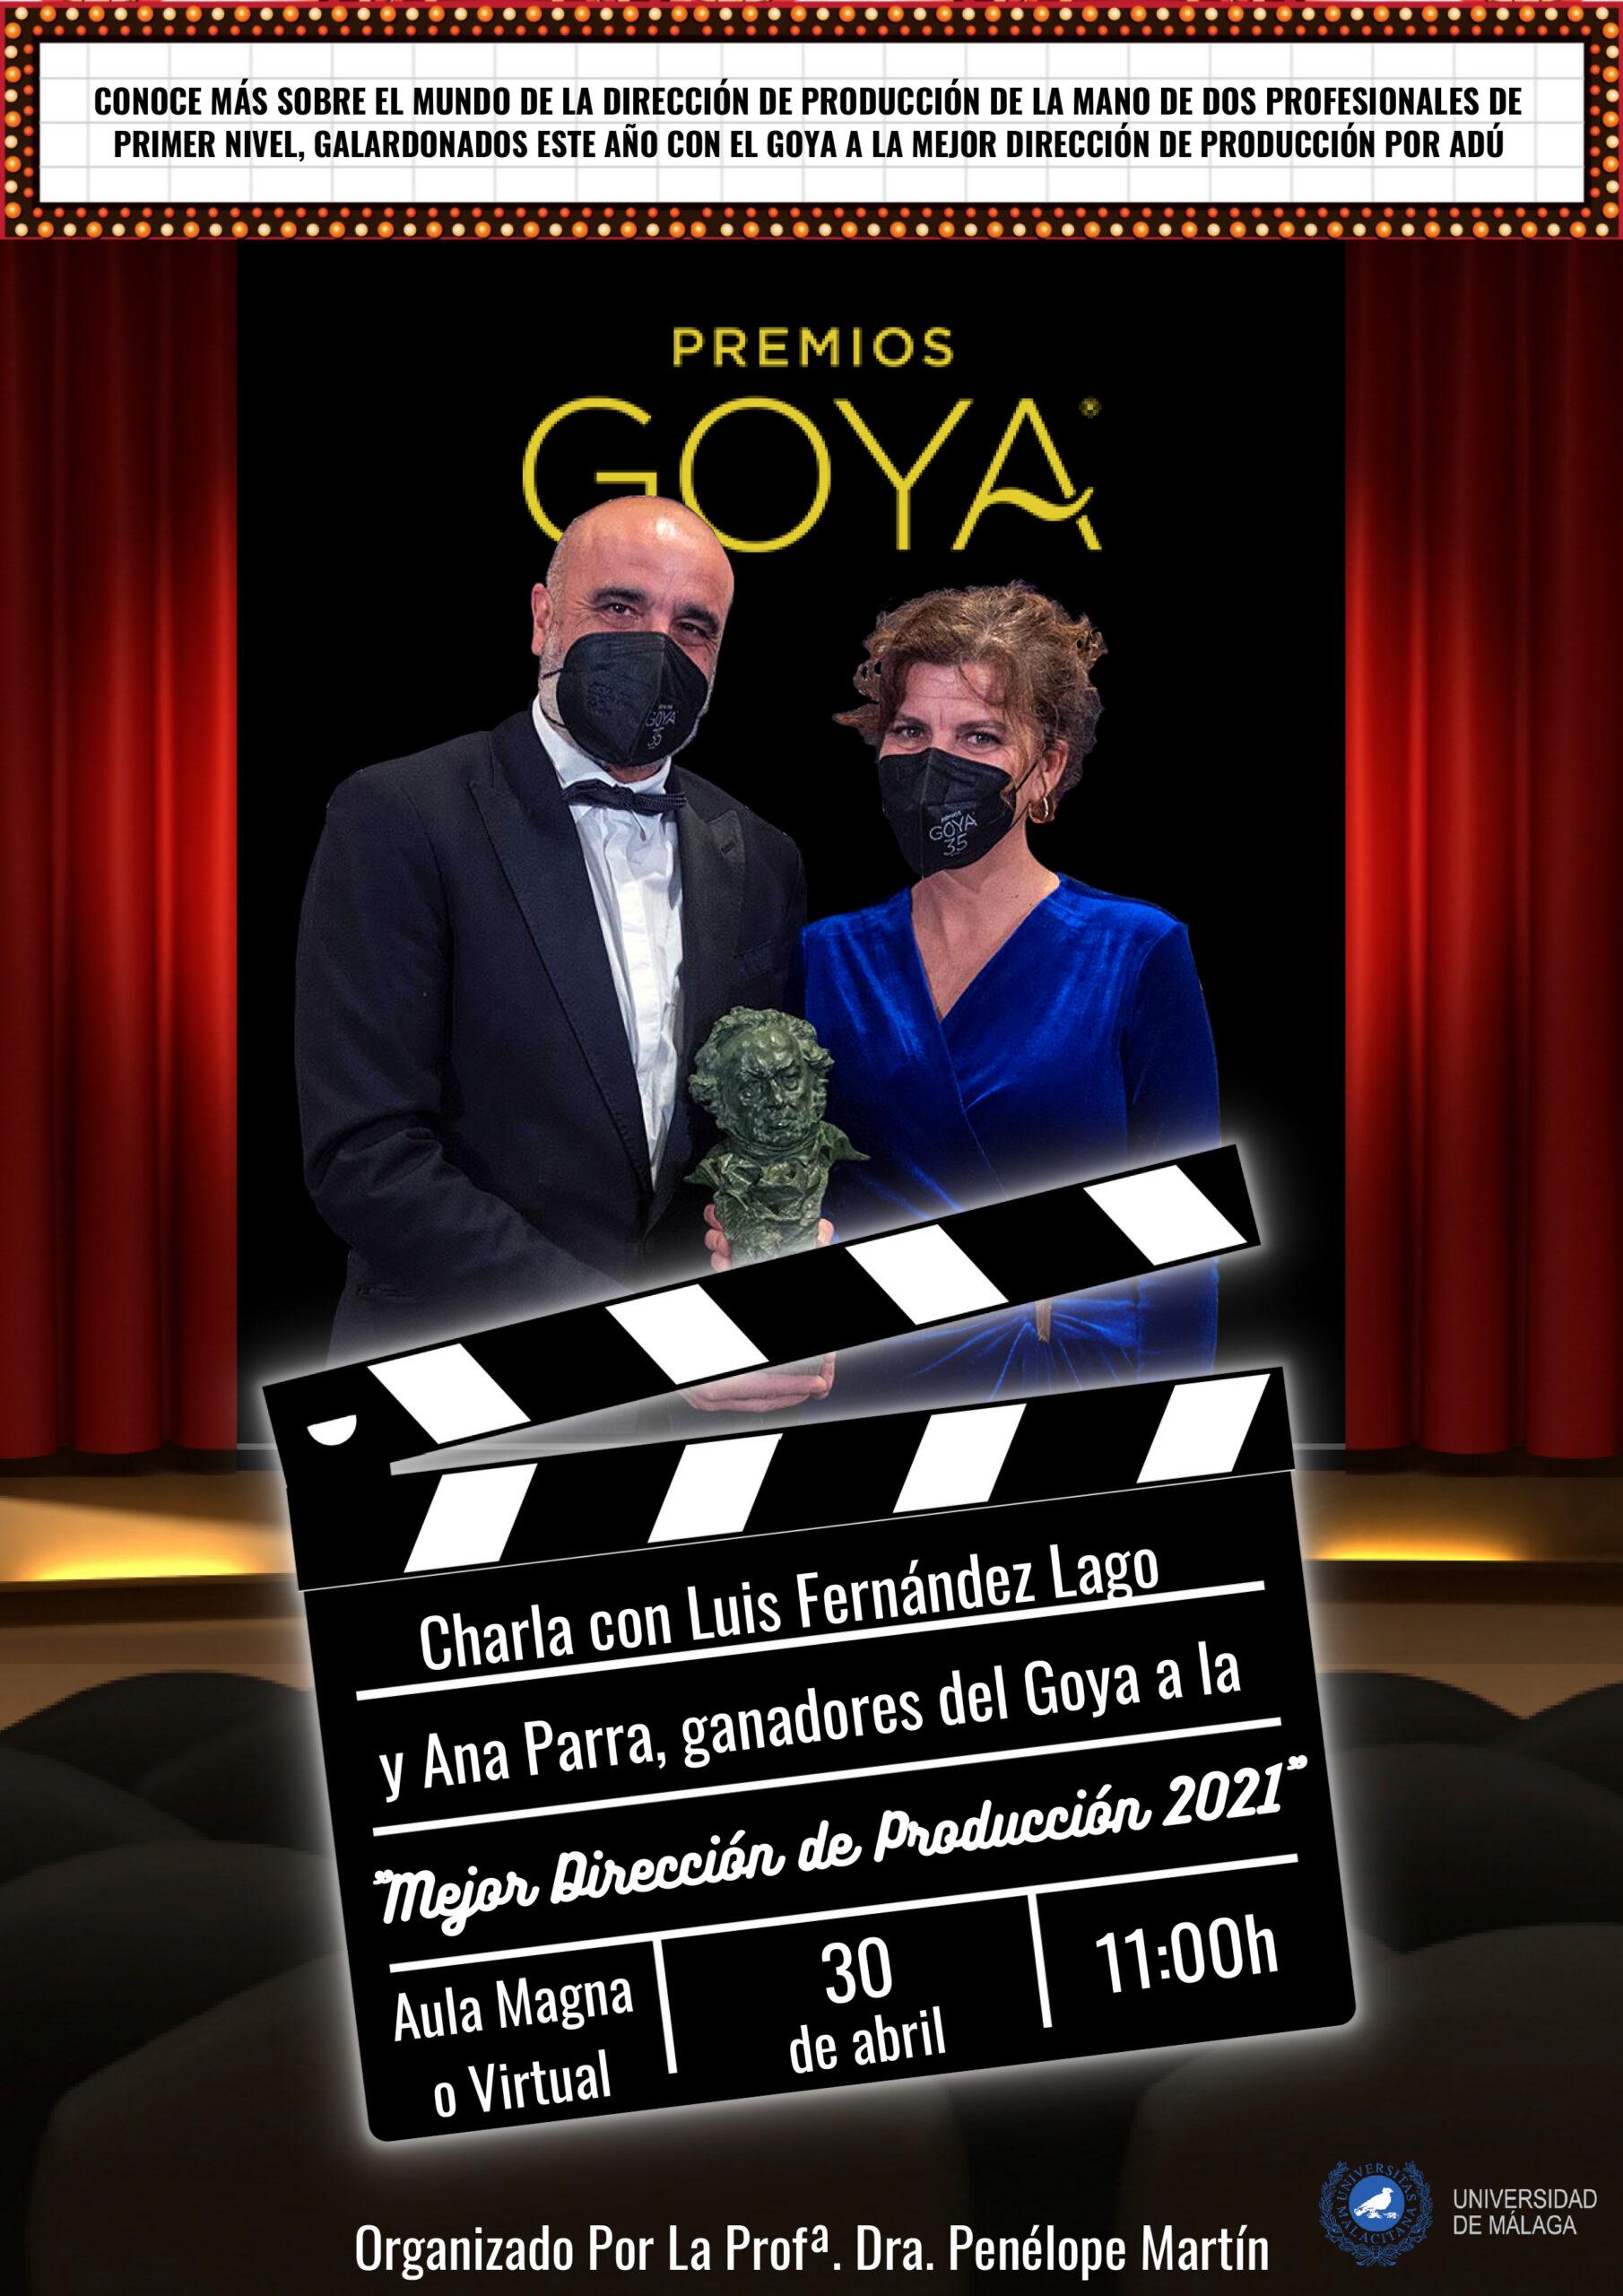 Ganadores del Goya a